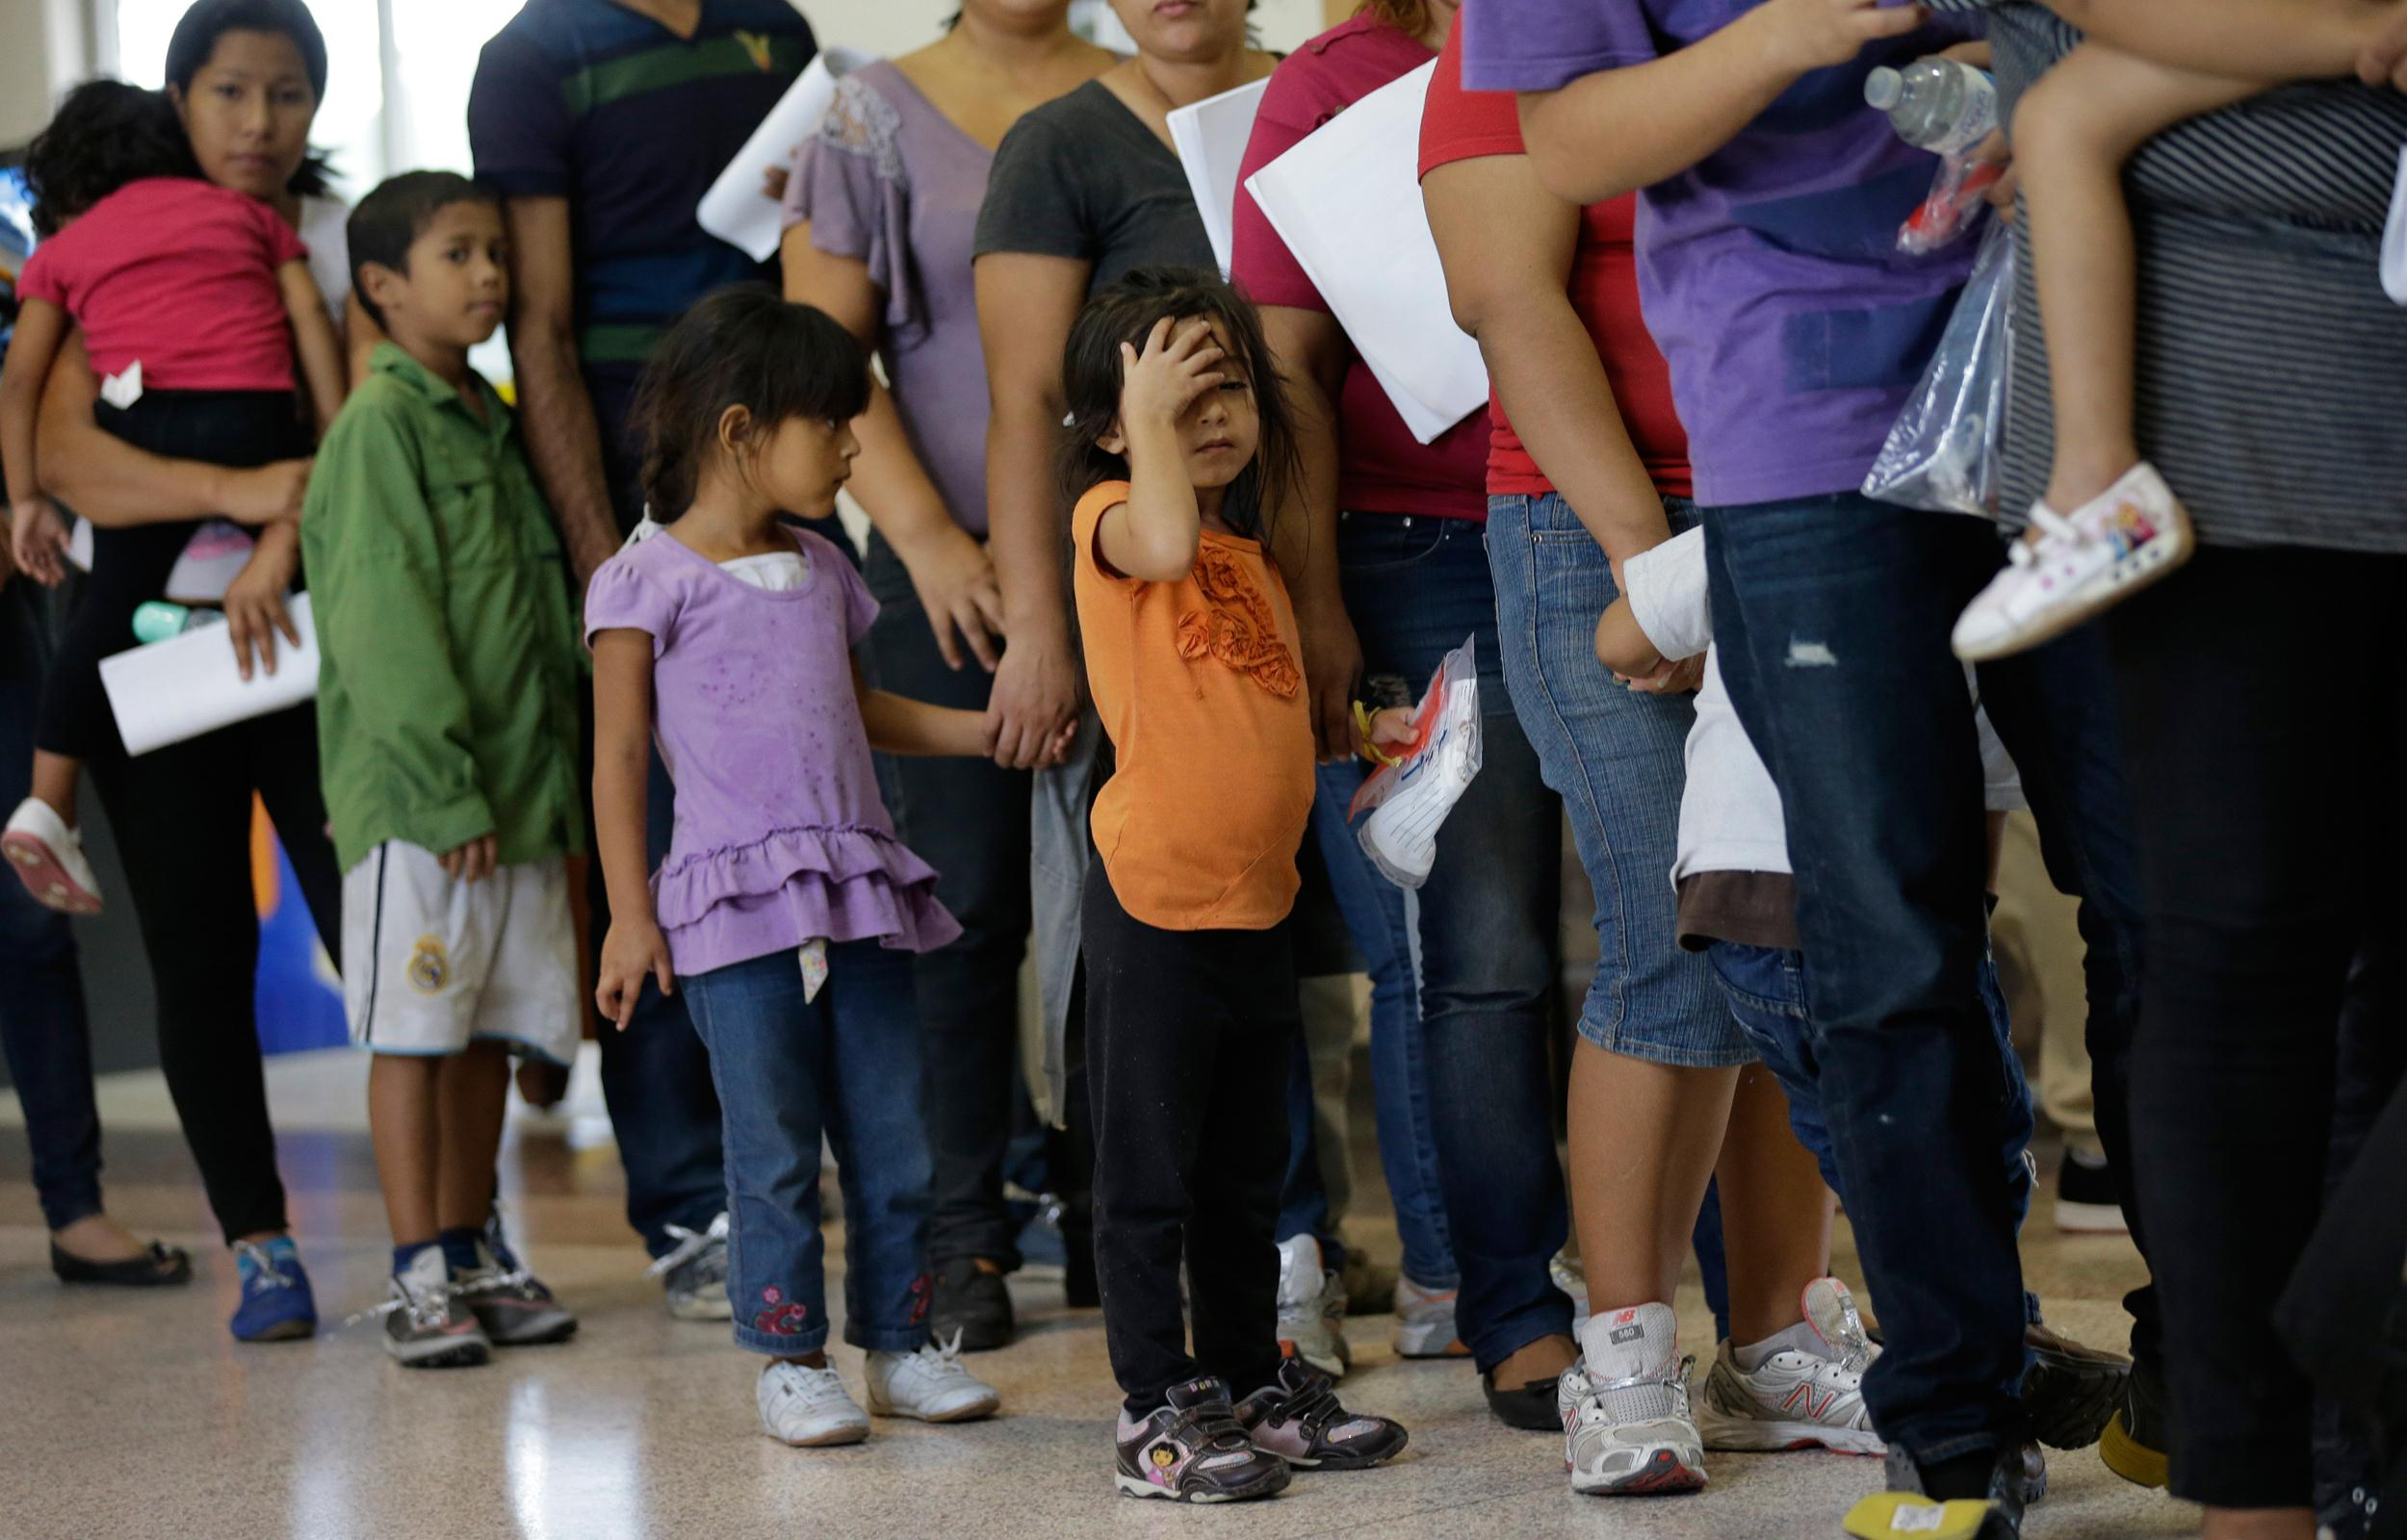 140713-immigration-children-border-1015a_aa2b90c8a46d4bd4bb8e2f3b0b4916af.jpg